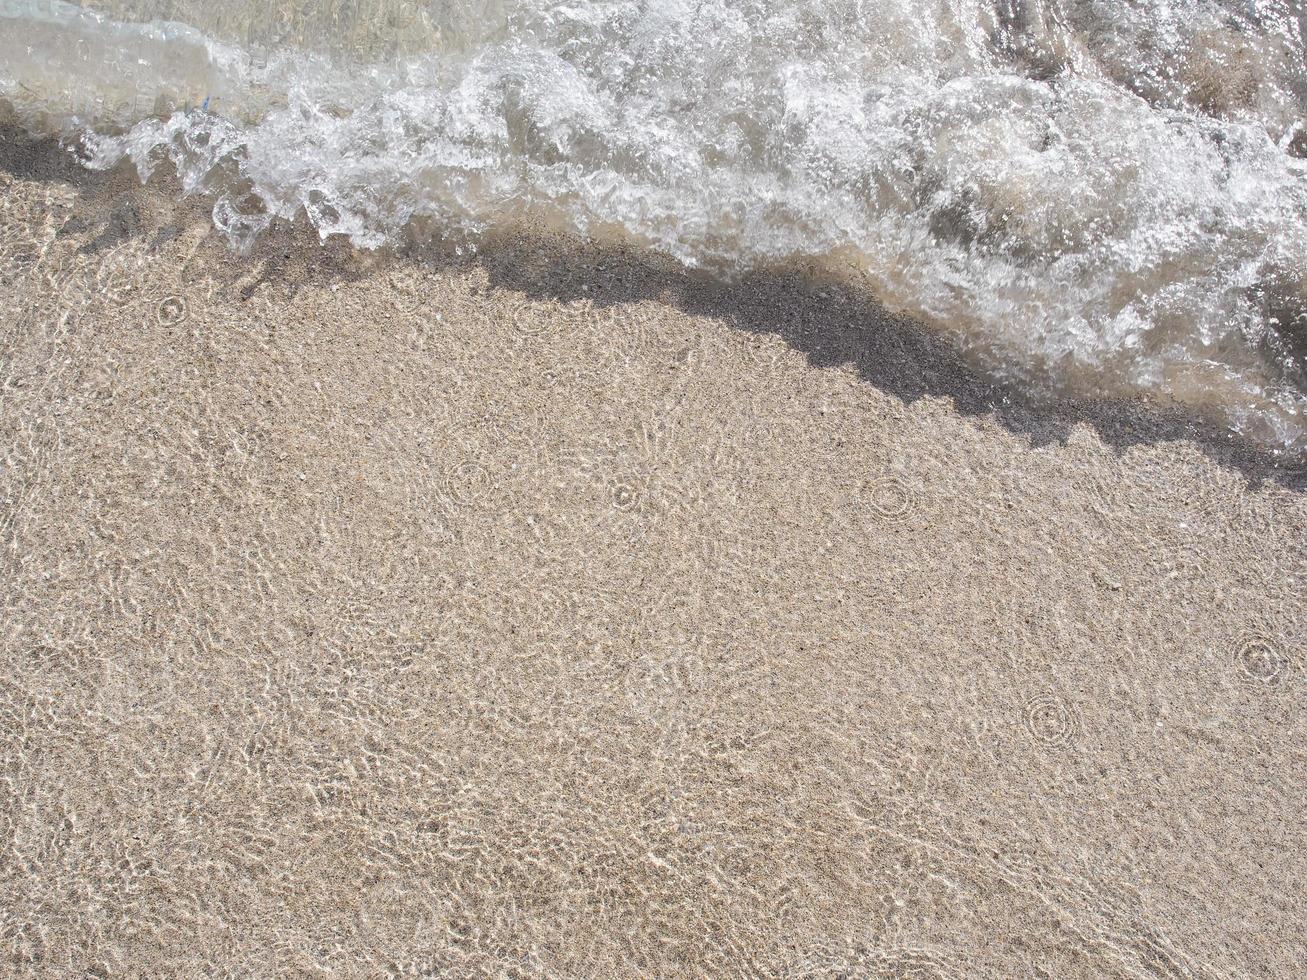 ondata di spiaggia di waikiki foto